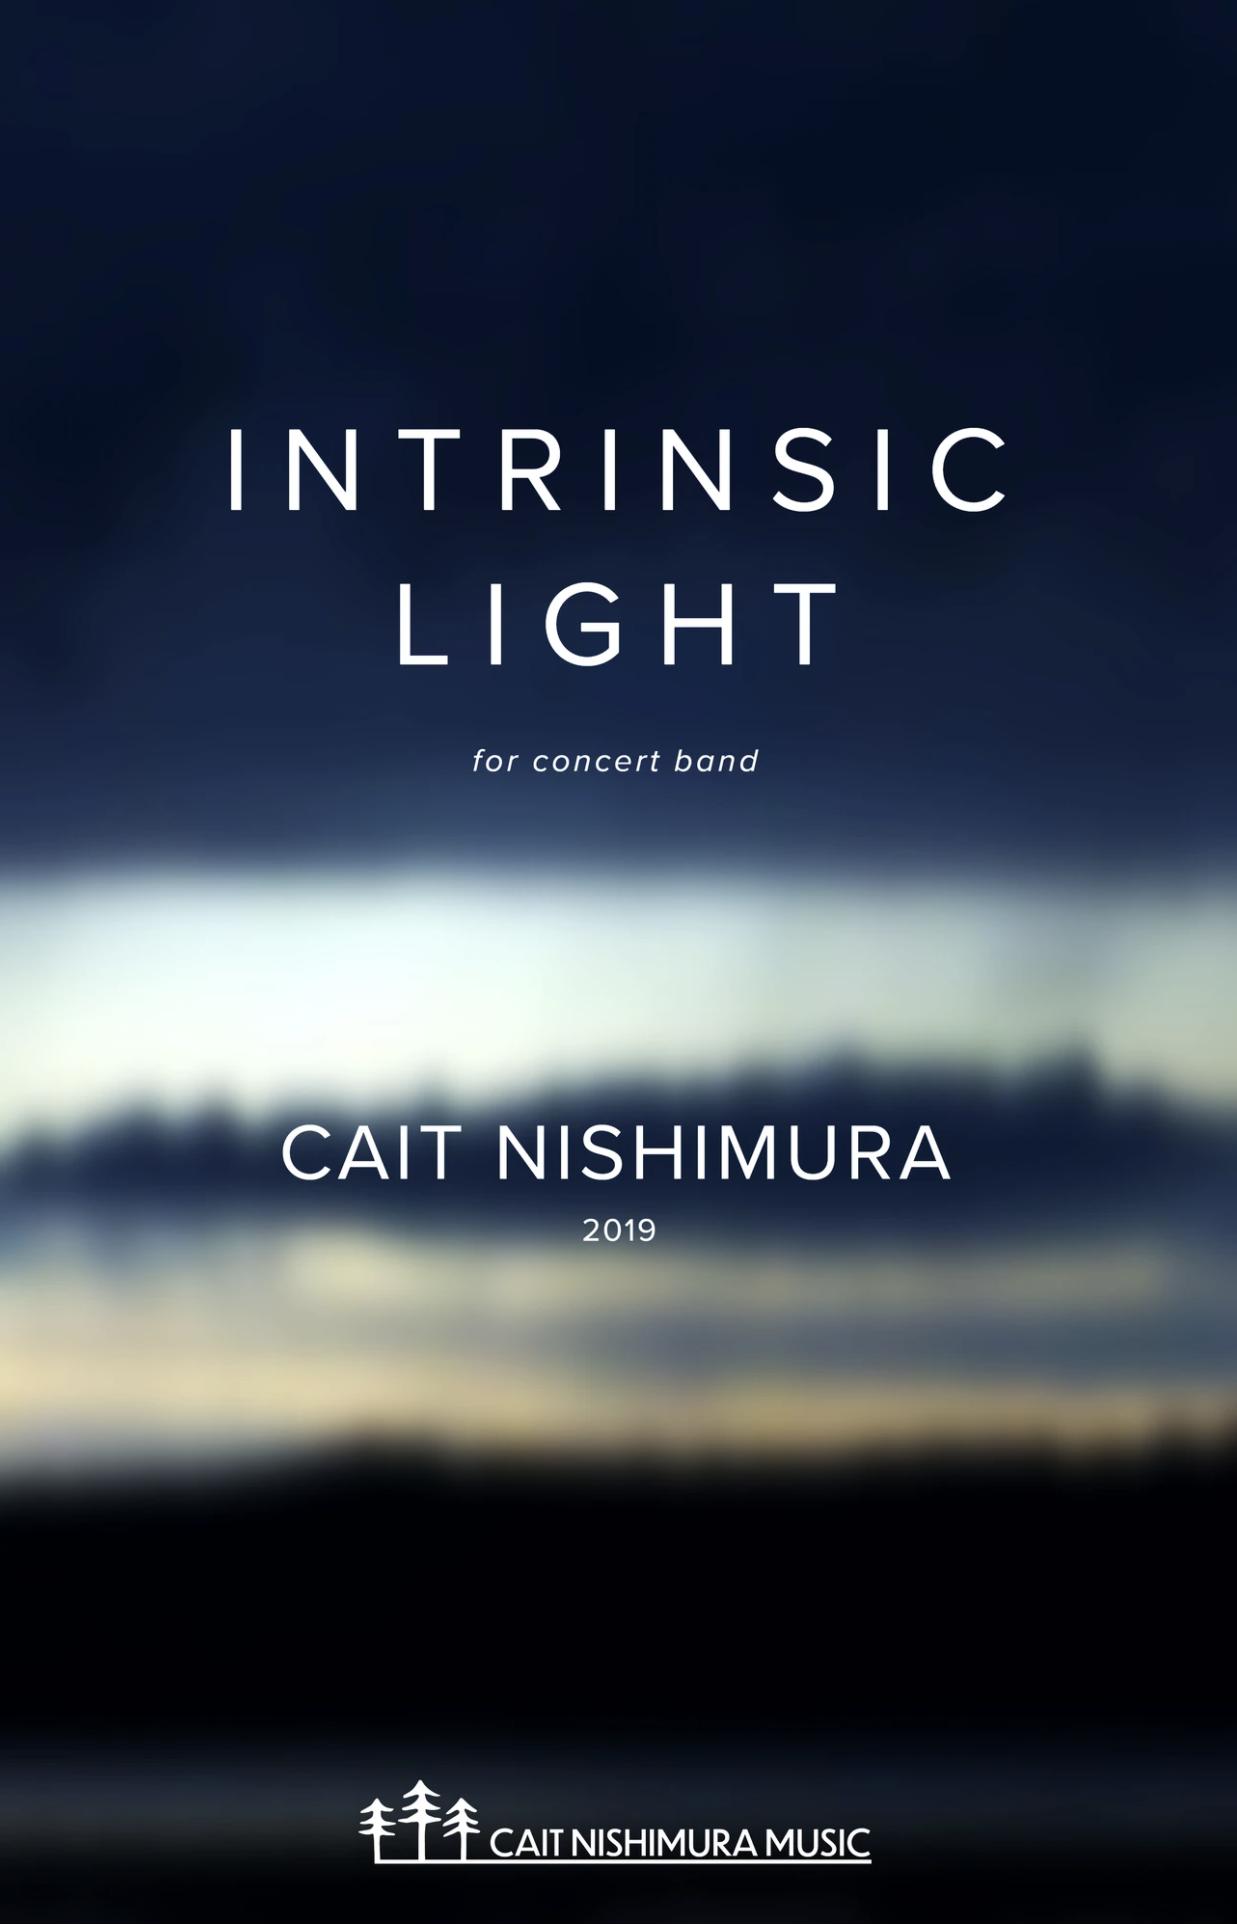 Intrinsic Light by Cait Nishimura